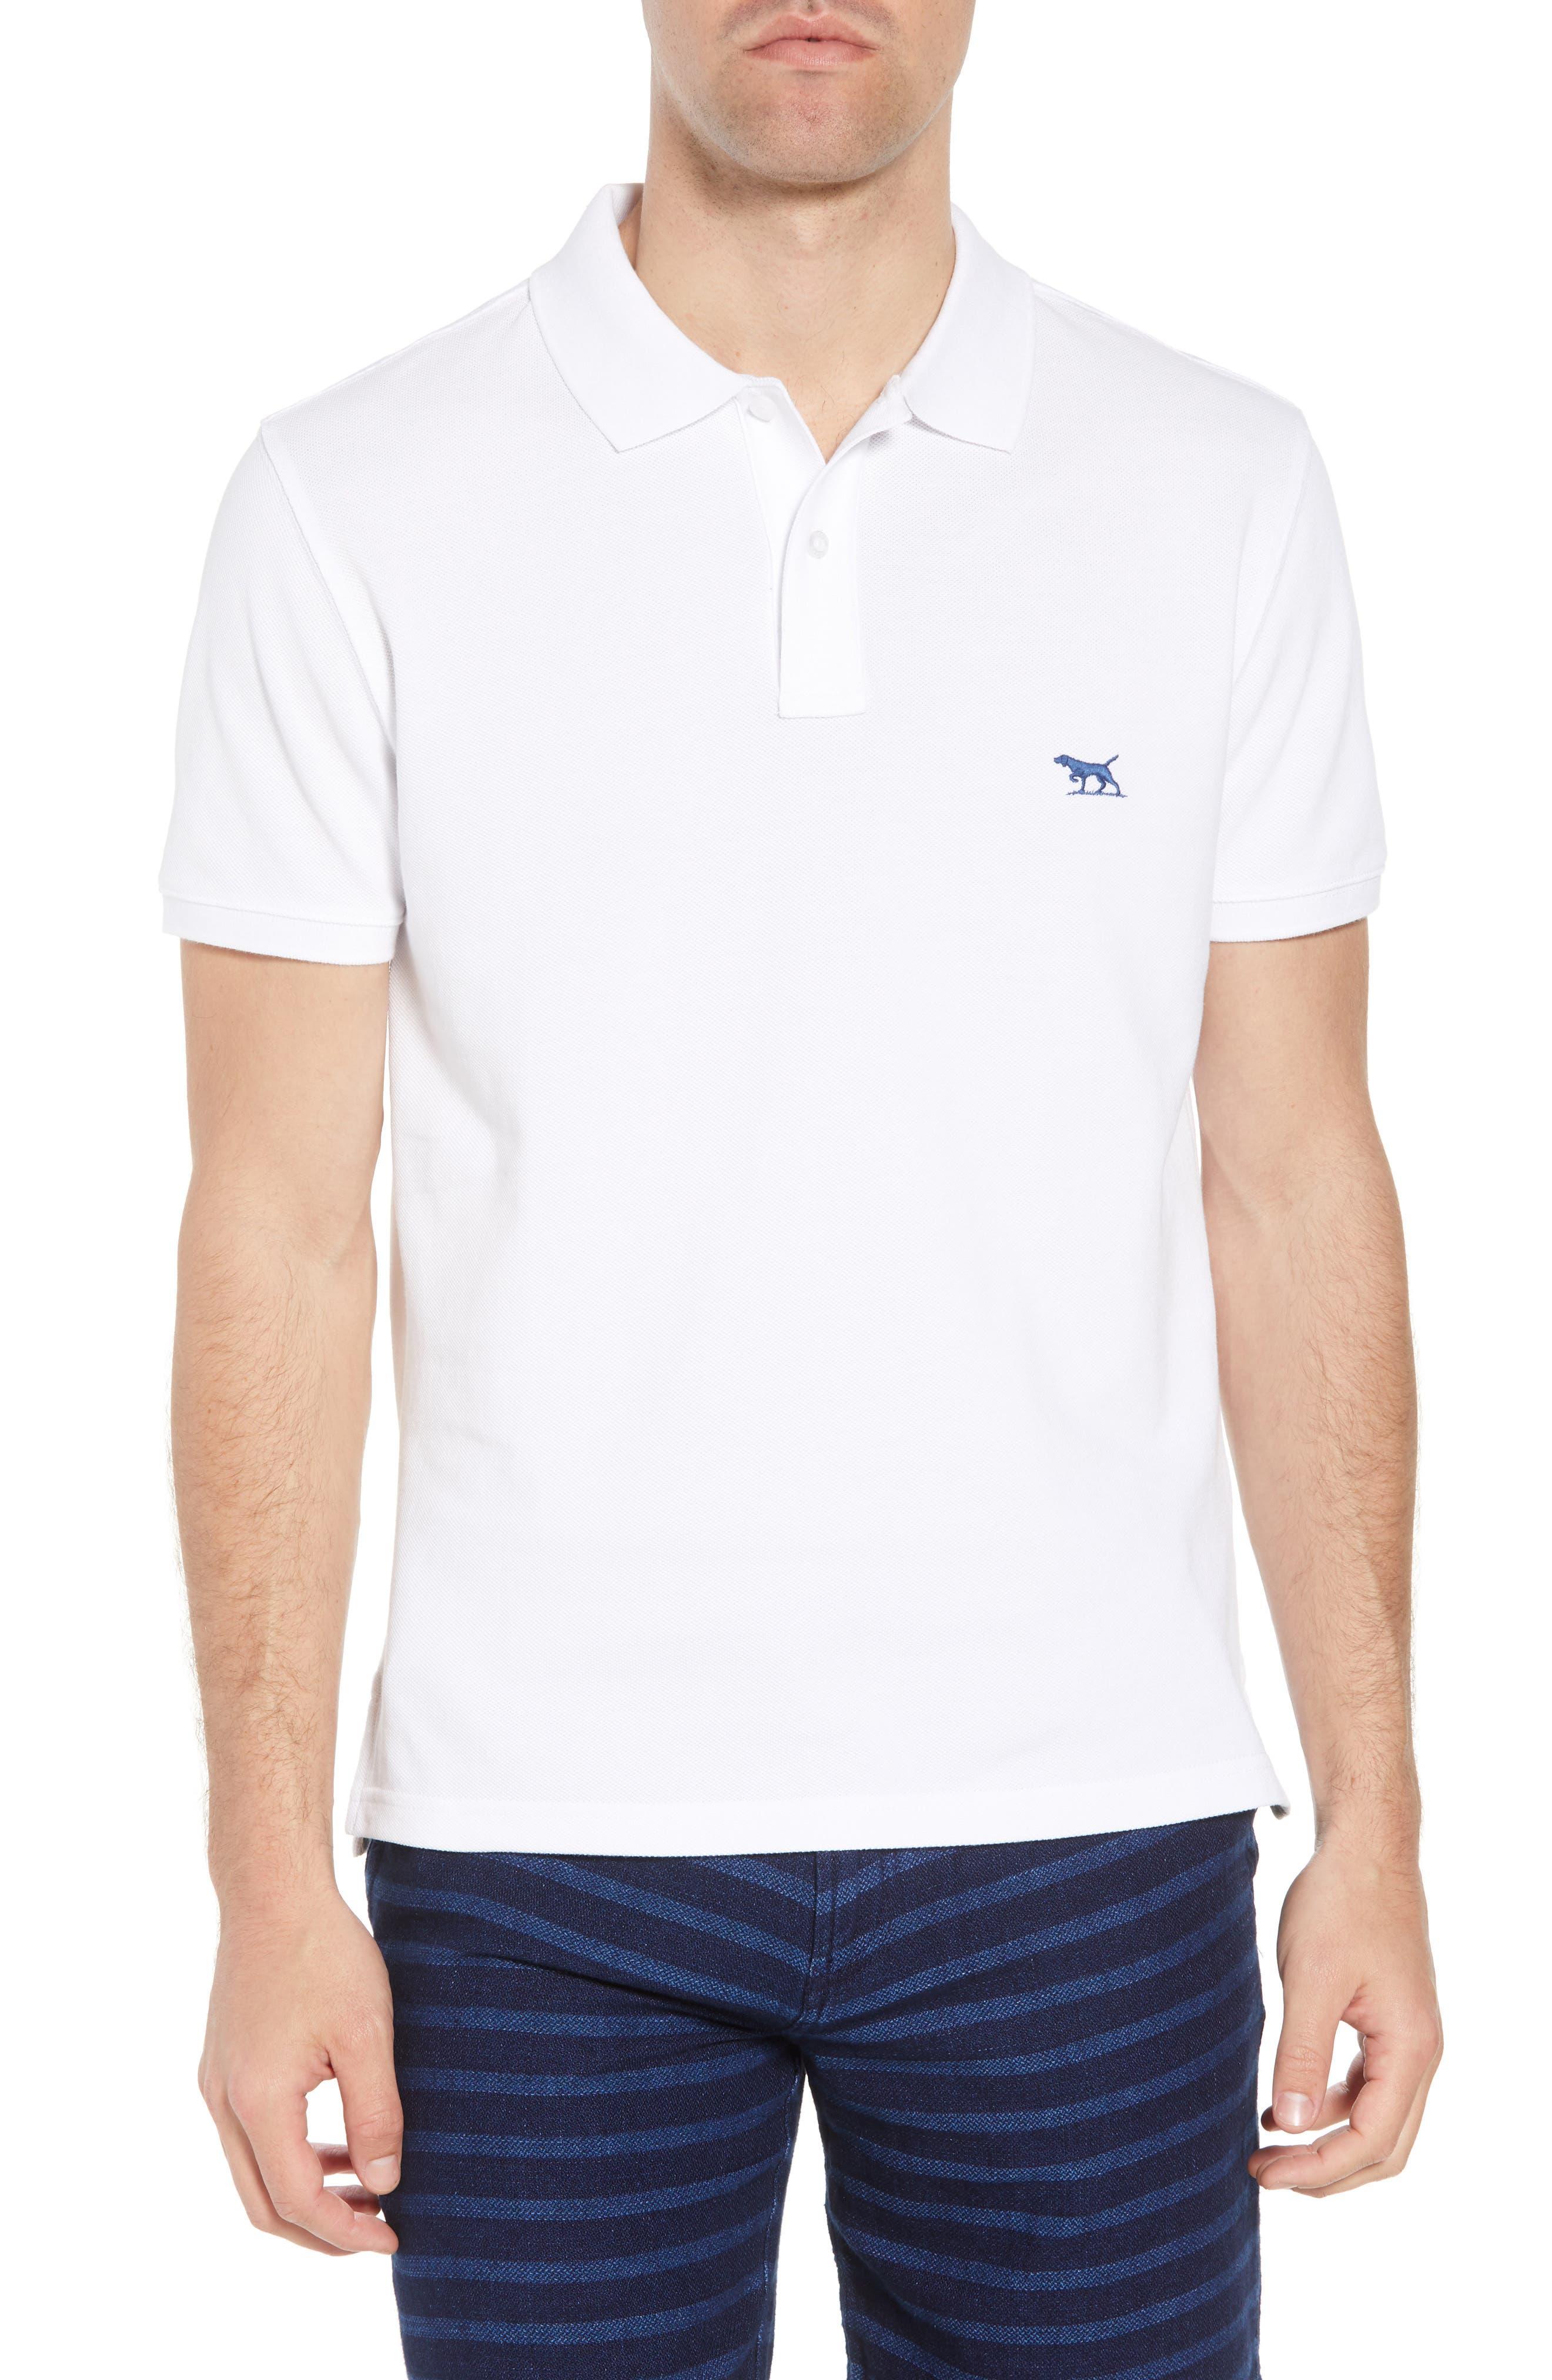 Alternate Image 1 Selected - Rodd & Gunn 'The Gunn' Piqué Sports Fit Cotton Polo